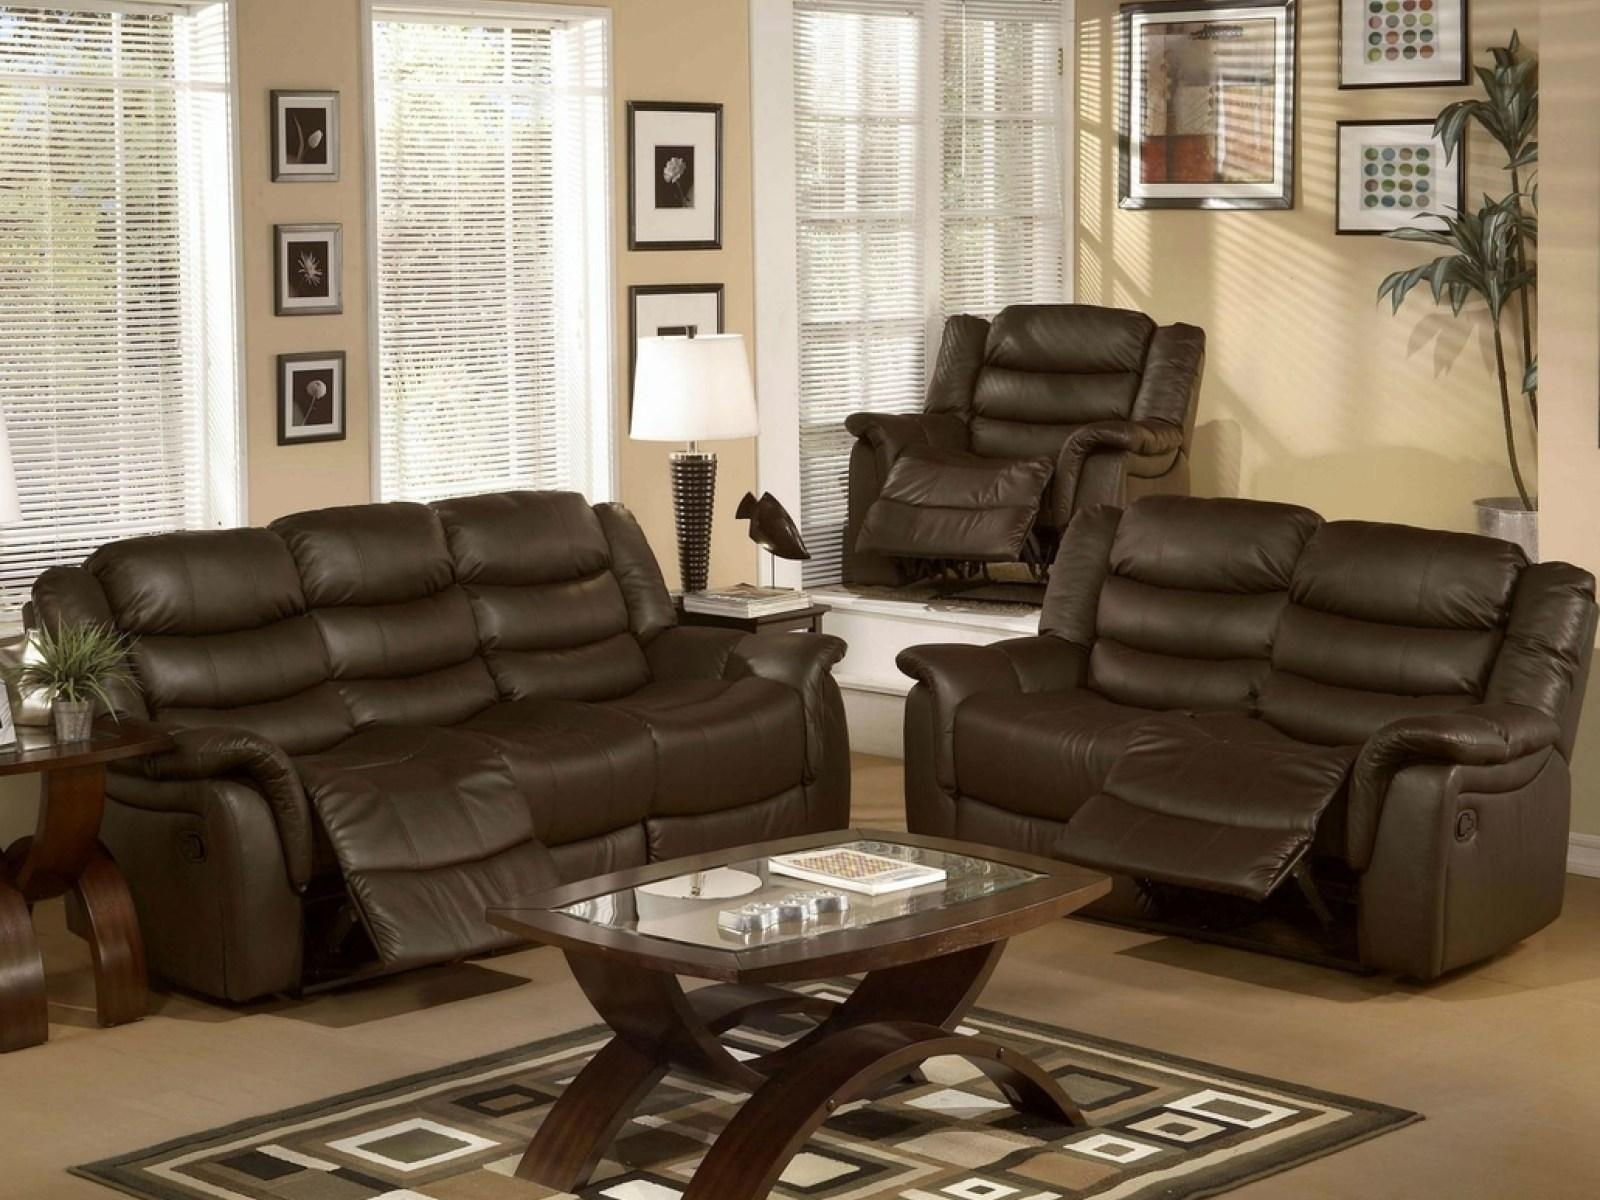 ▻ Sofa : Lovely Loveseat Sofa Riveting Small Apartment Loveseat Regarding Sofa Loveseat And Chairs (Image 1 of 20)